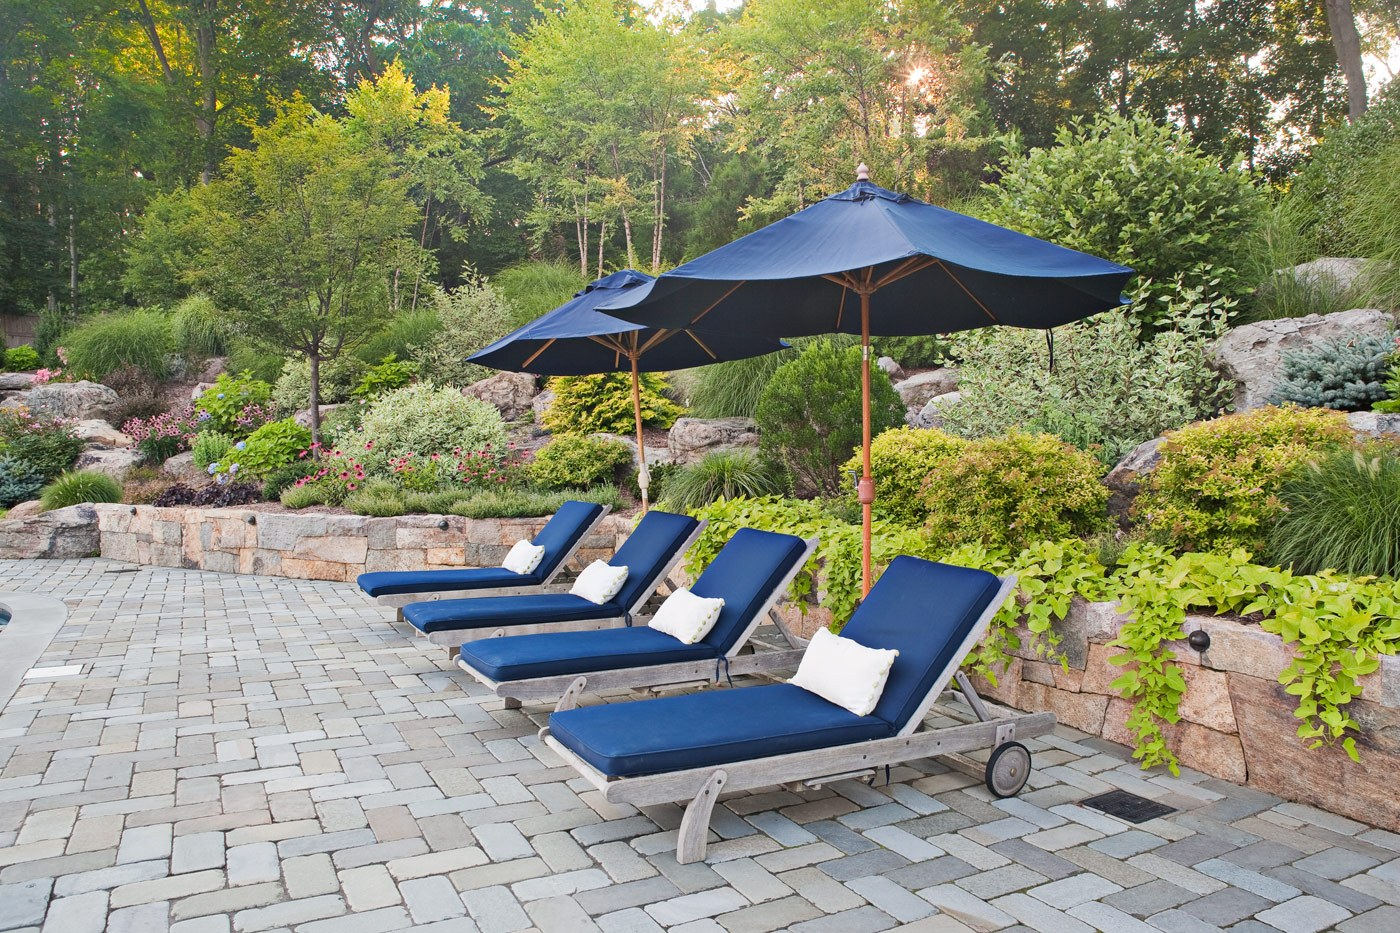 natural stone patio by cording landscape design in nj